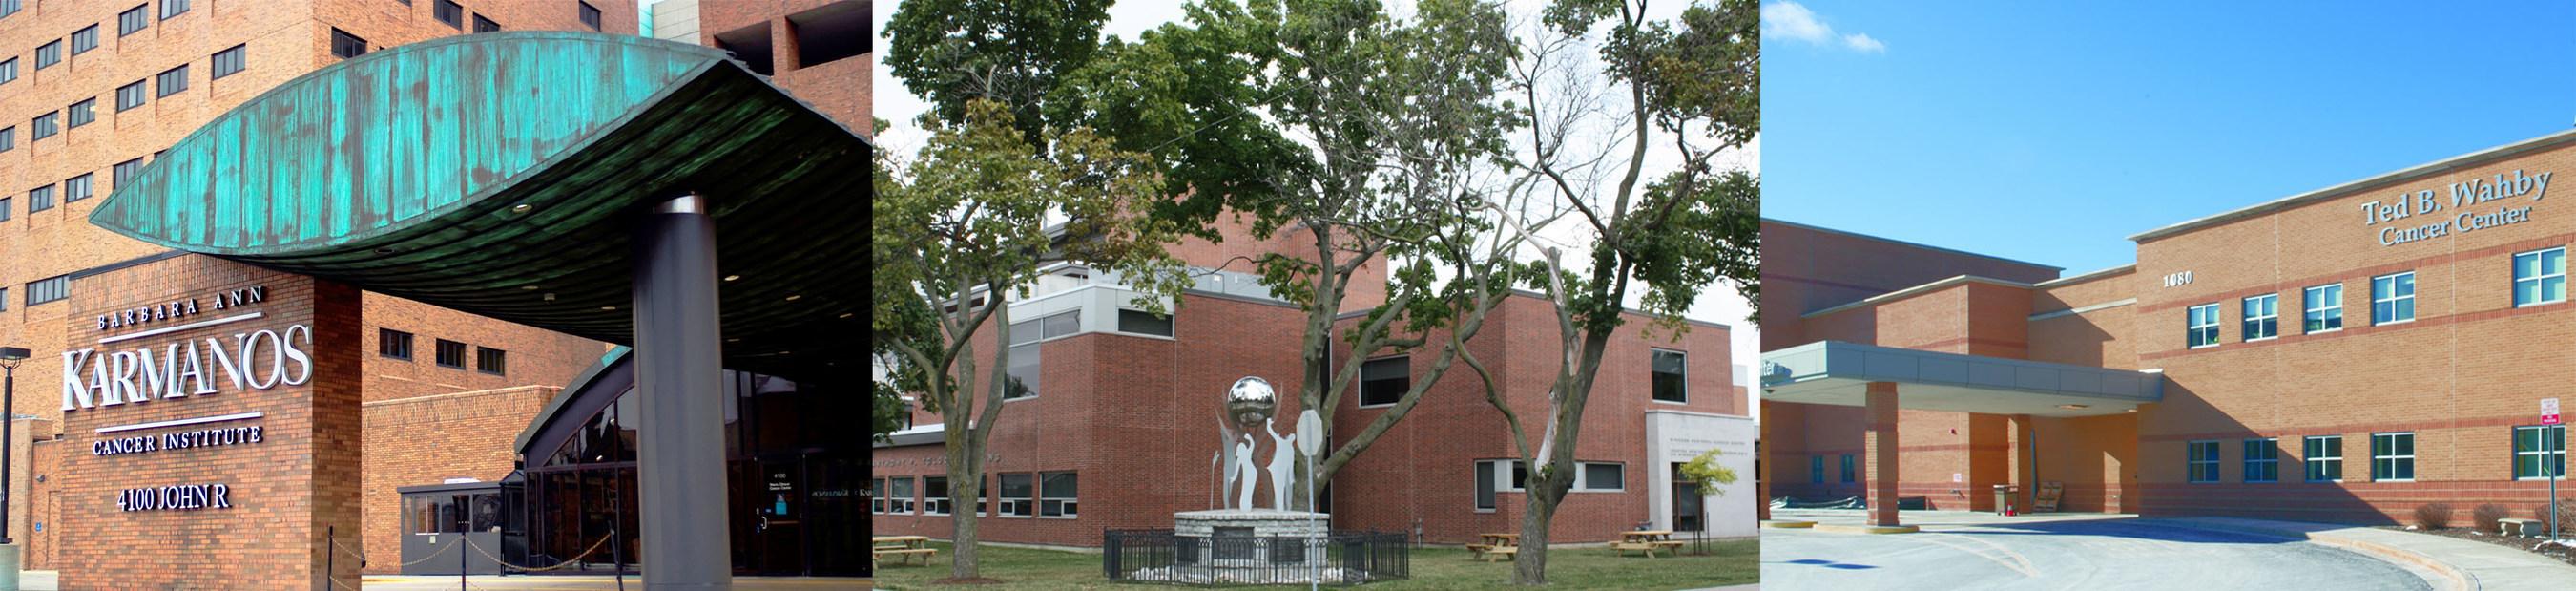 Karmanos Cancer Institute in Detroit and Windsor Regional